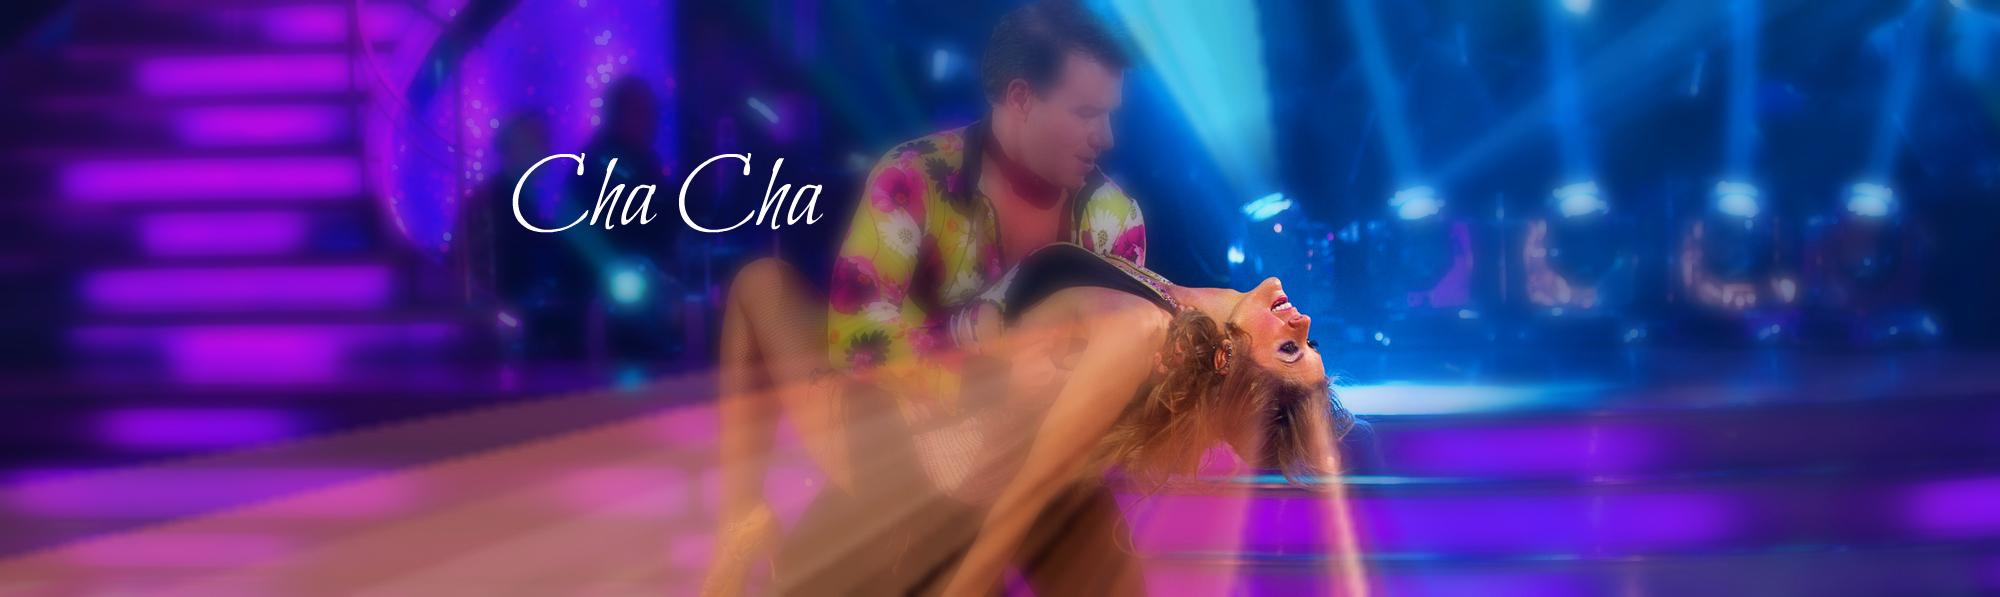 learn cha cha at peninsula ballroom dancing lessons northern beaches.jpg